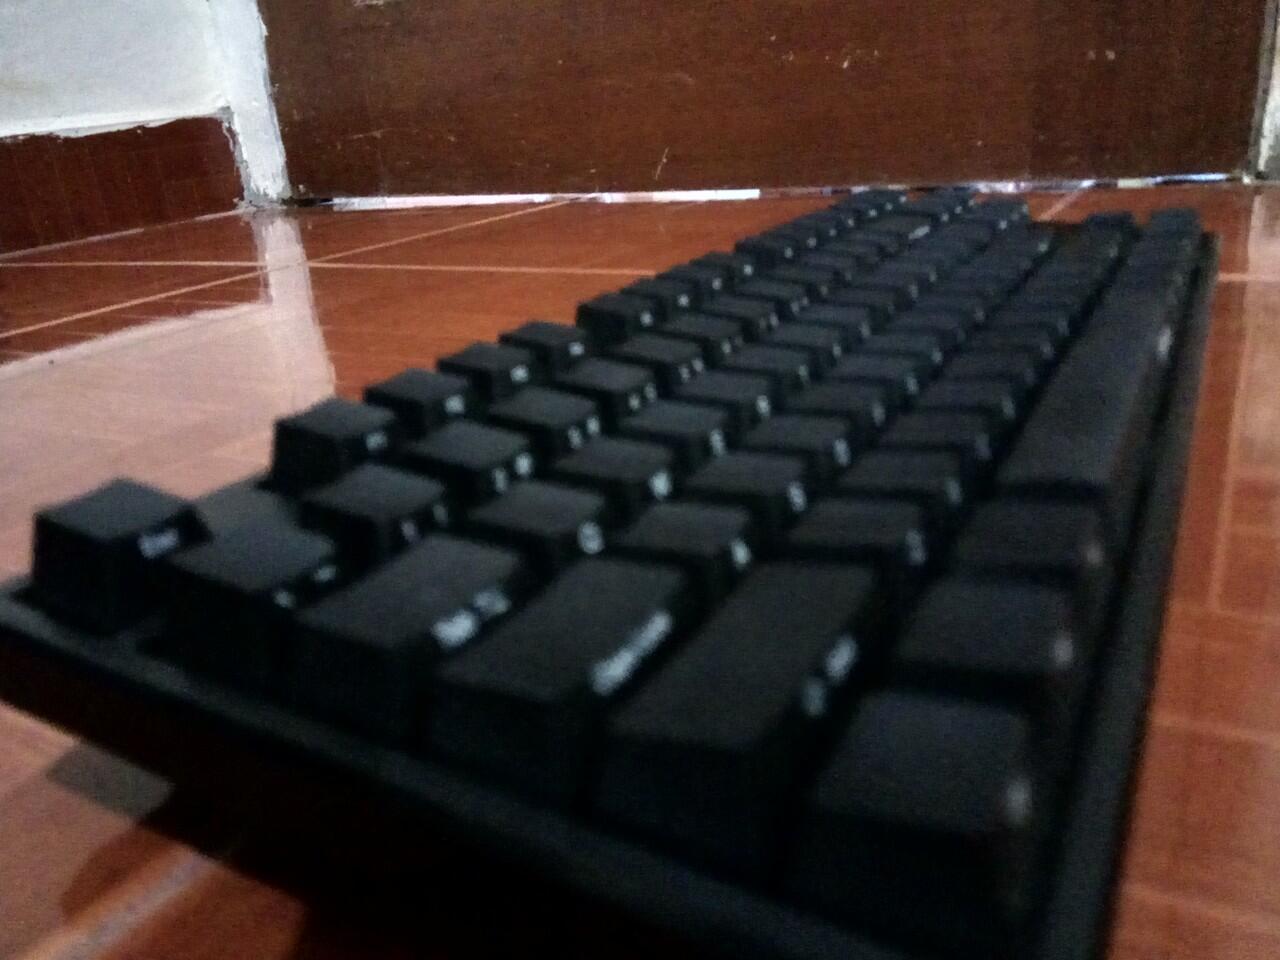 [WTS] KeyBoard Ducky One TKL Non LED (2nd) kondisi 99% + (Bonus) Rainbow Keycaps